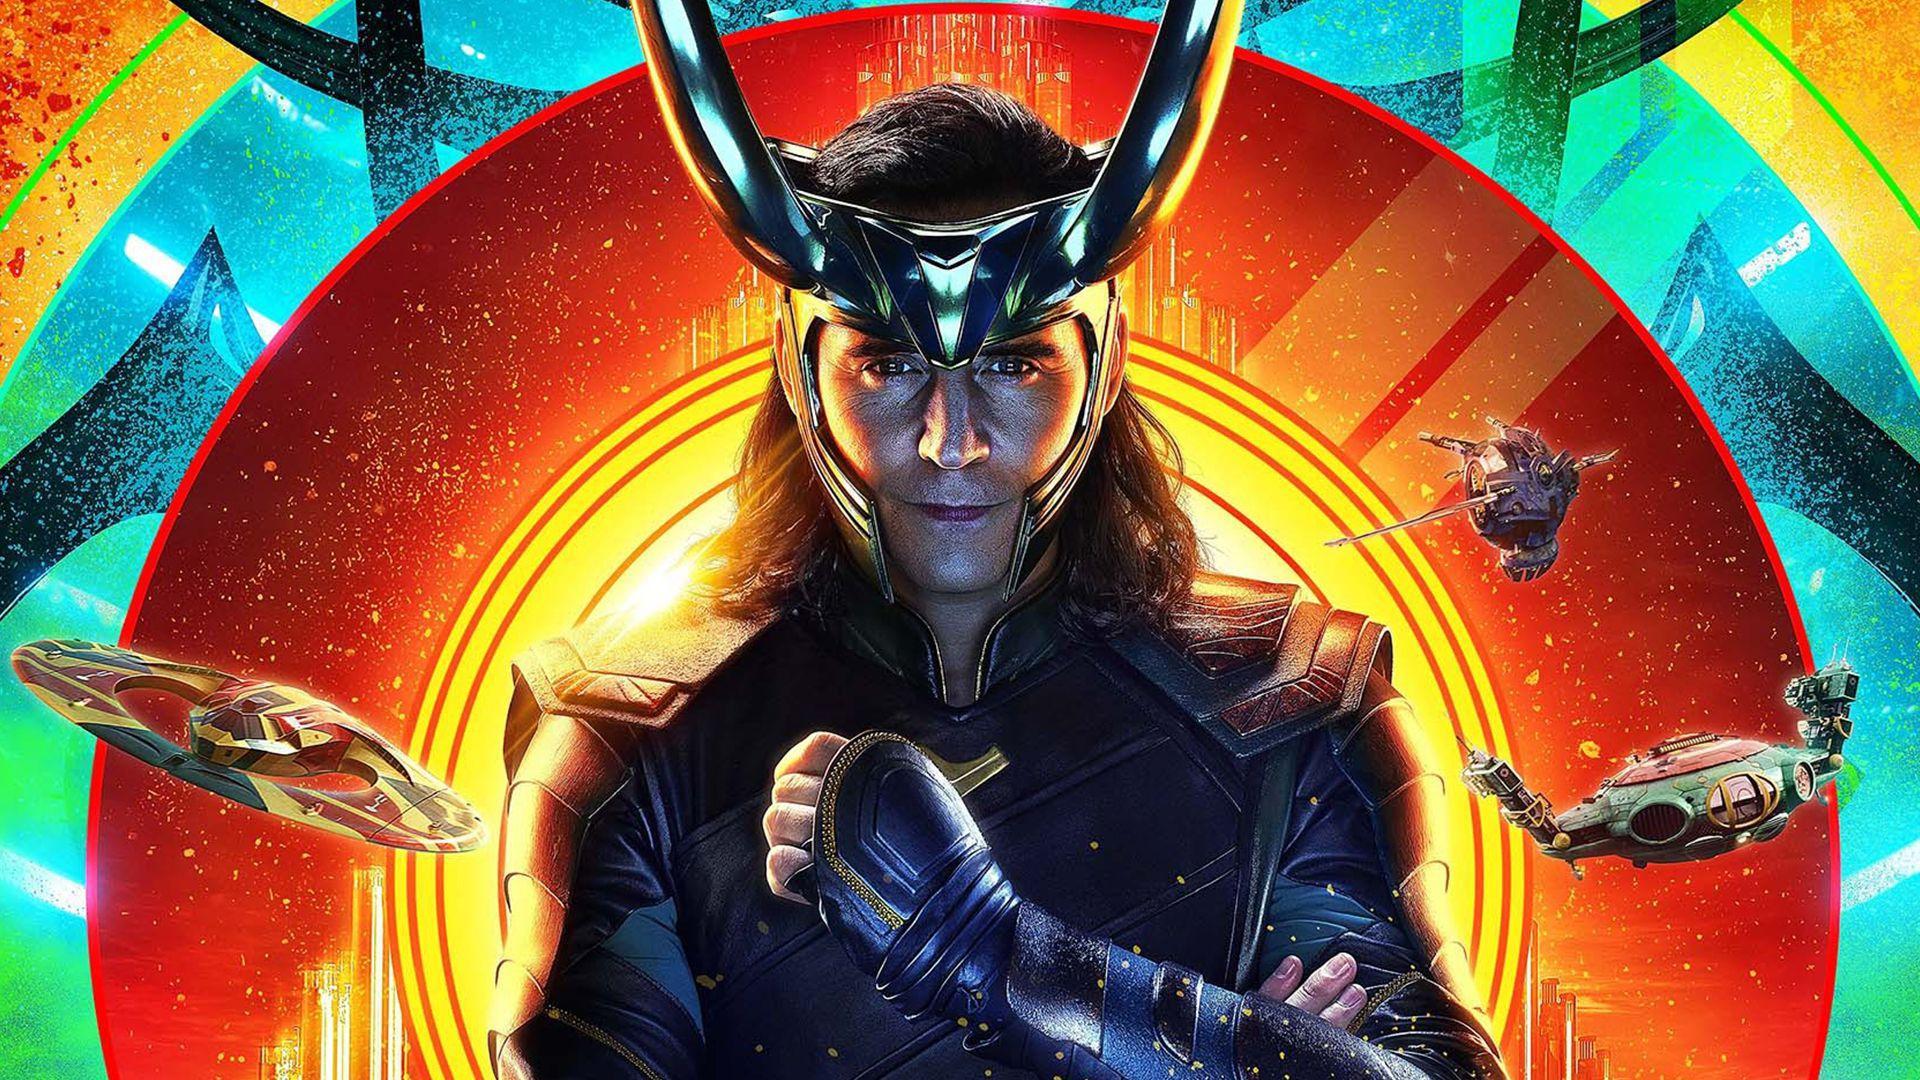 Thor Ragnarok Loki Wallpaper Hd Loki Ragnarok Wallpapers Top Free Loki Ragnarok Backgrounds Wallpaperaccess loki ragnarok wallpapers top free